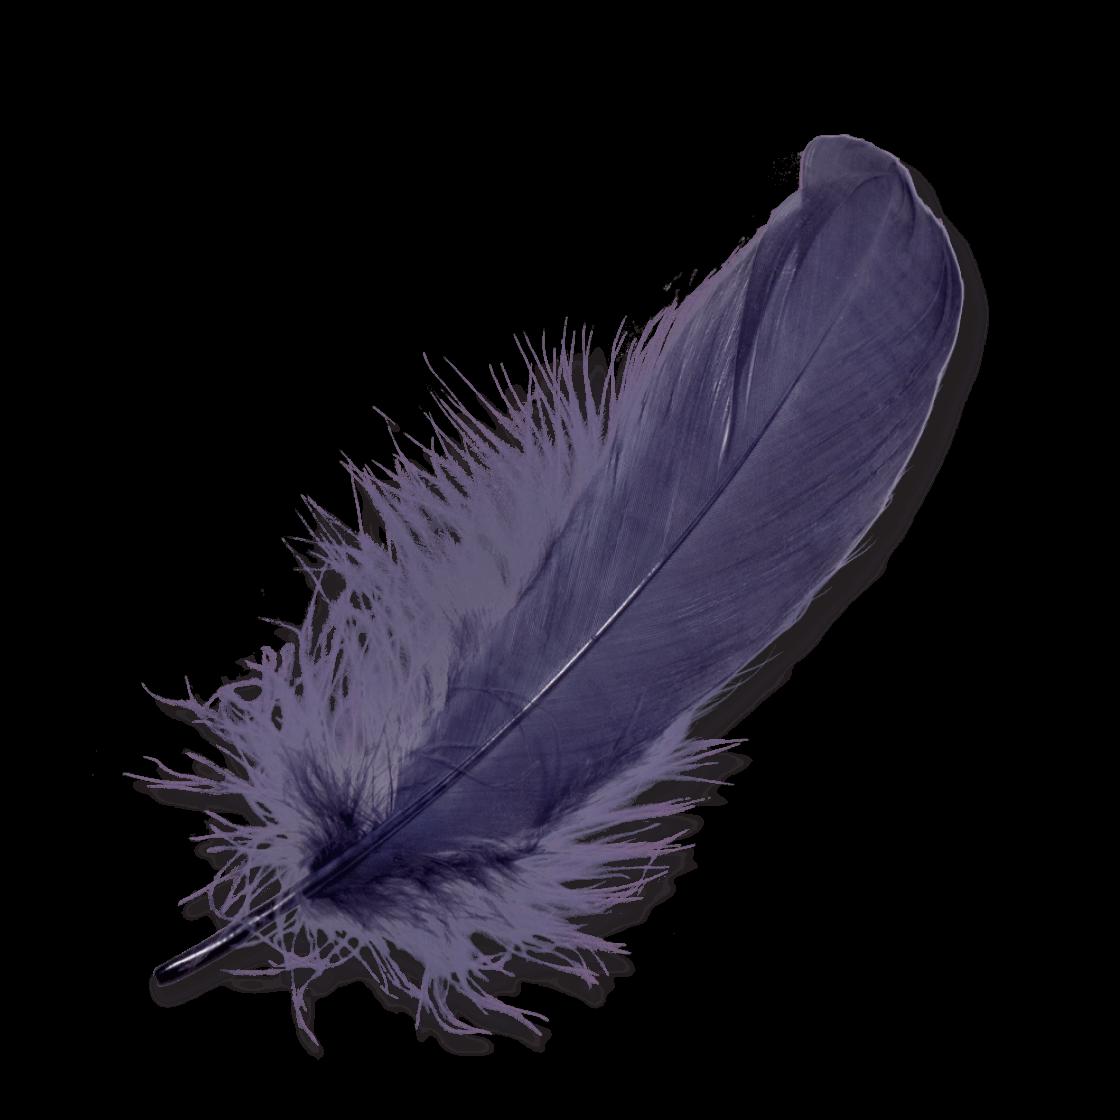 Purple transparent png stickpng. Feather clipart creative